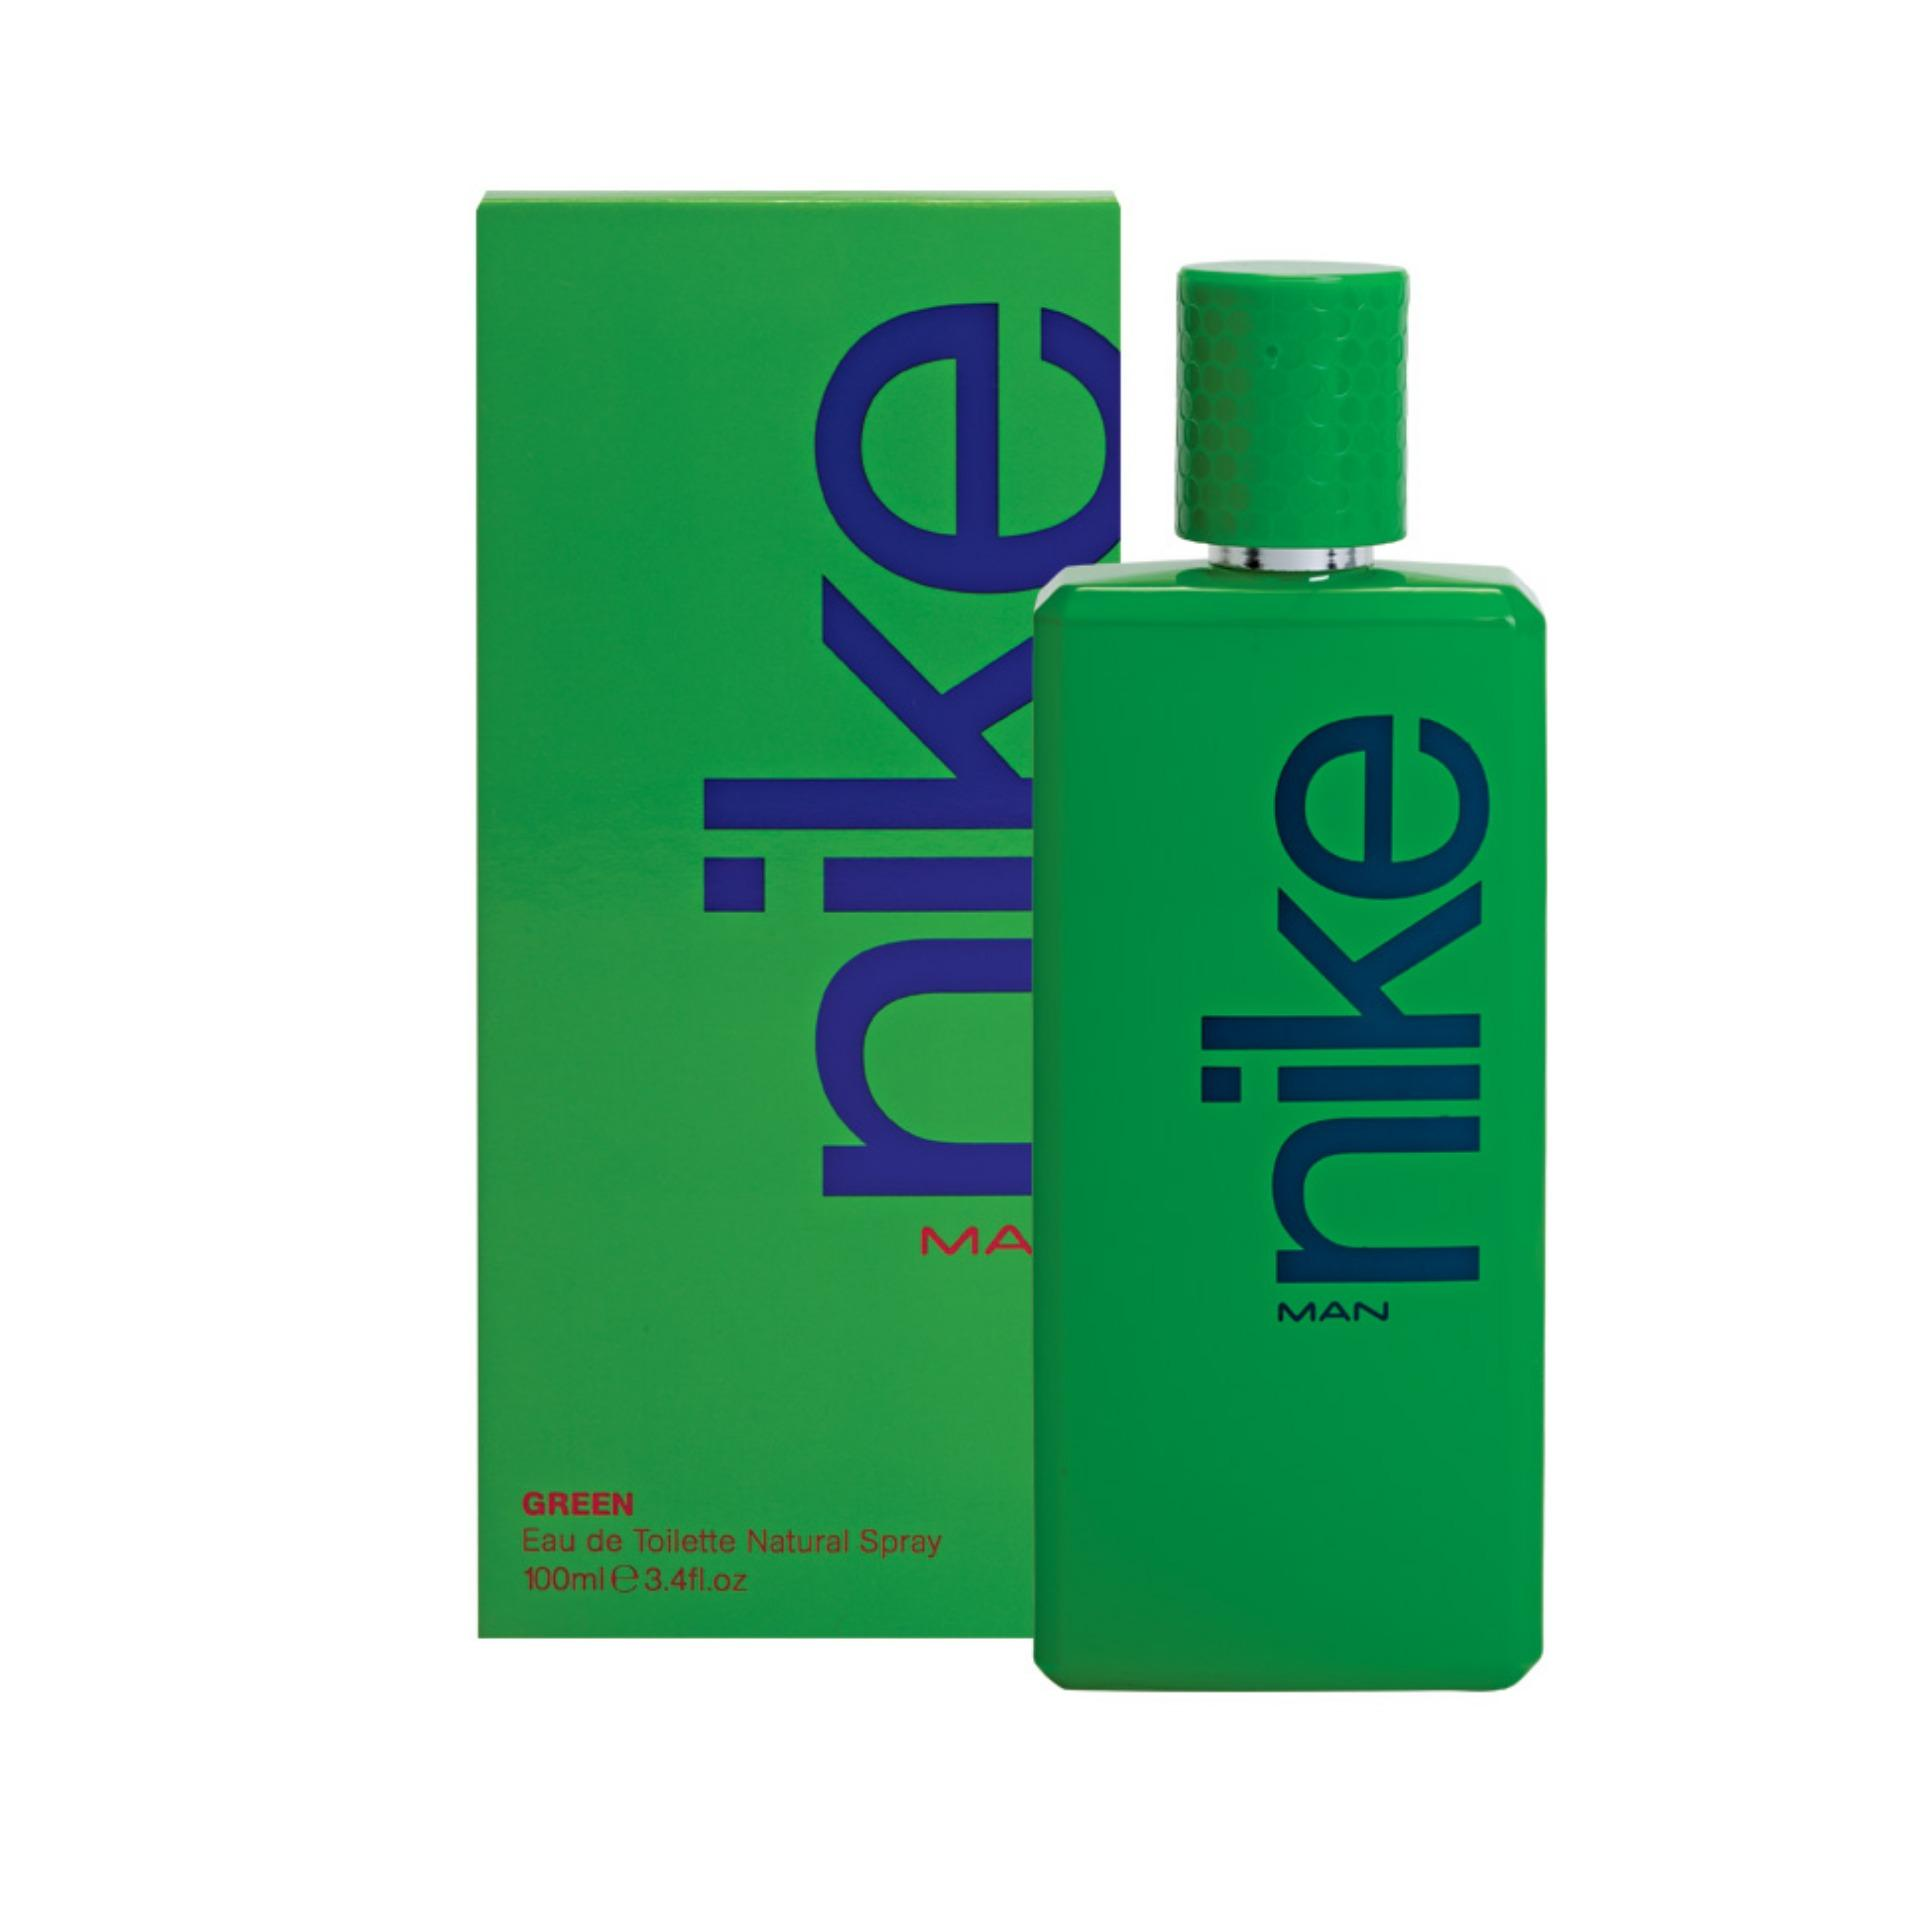 Fragrances Brands Mens And Womens Fragrance On Sale Prices Set Jafra Gentleman Edt 100ml Nike Green Man Eau De Toilette